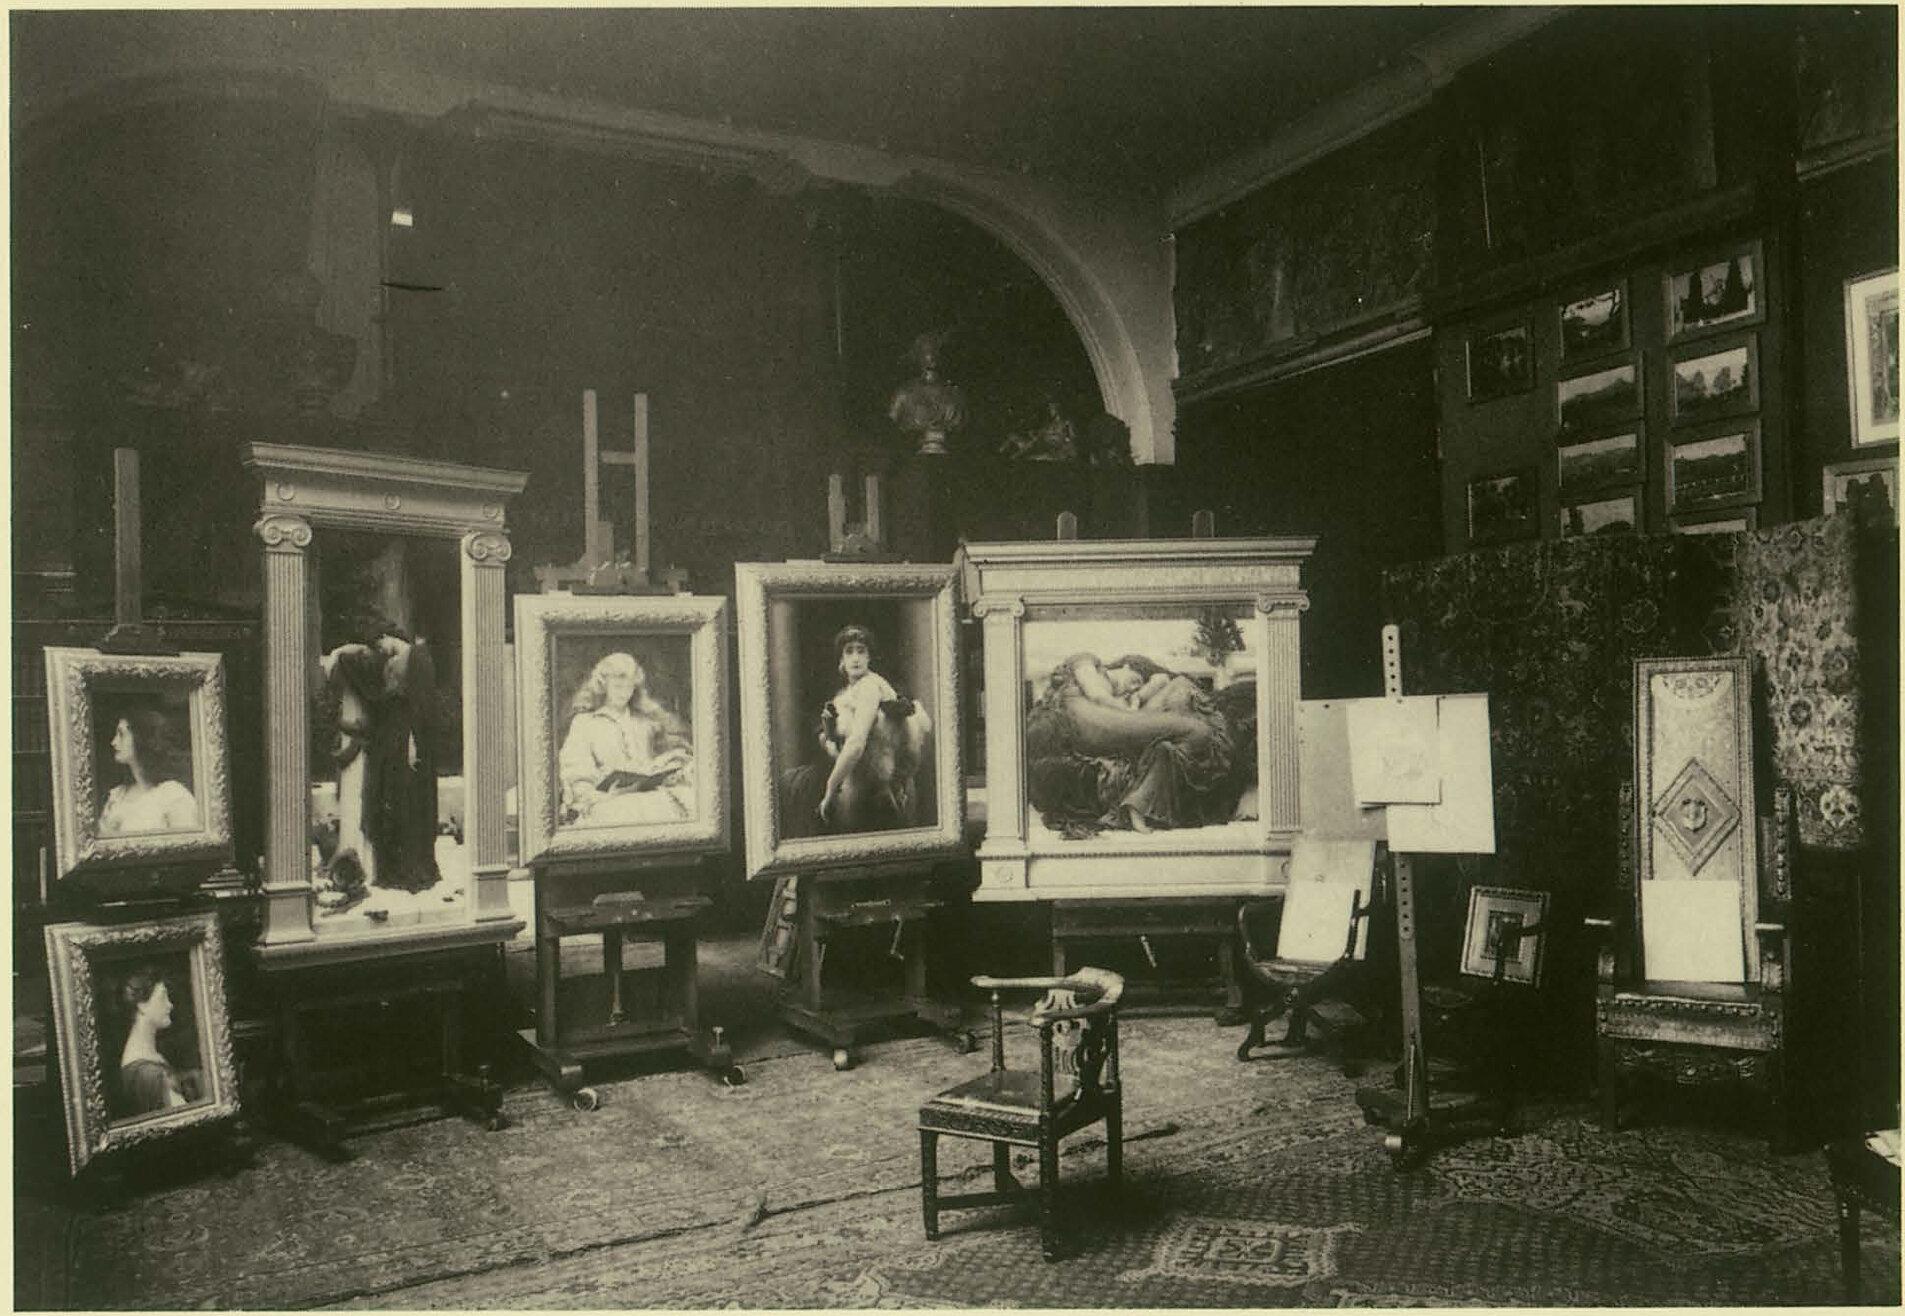 Lord Leighton's studio, 2 Addison Road, Kensington, London 1895. Photography courtesy National Monument Records.